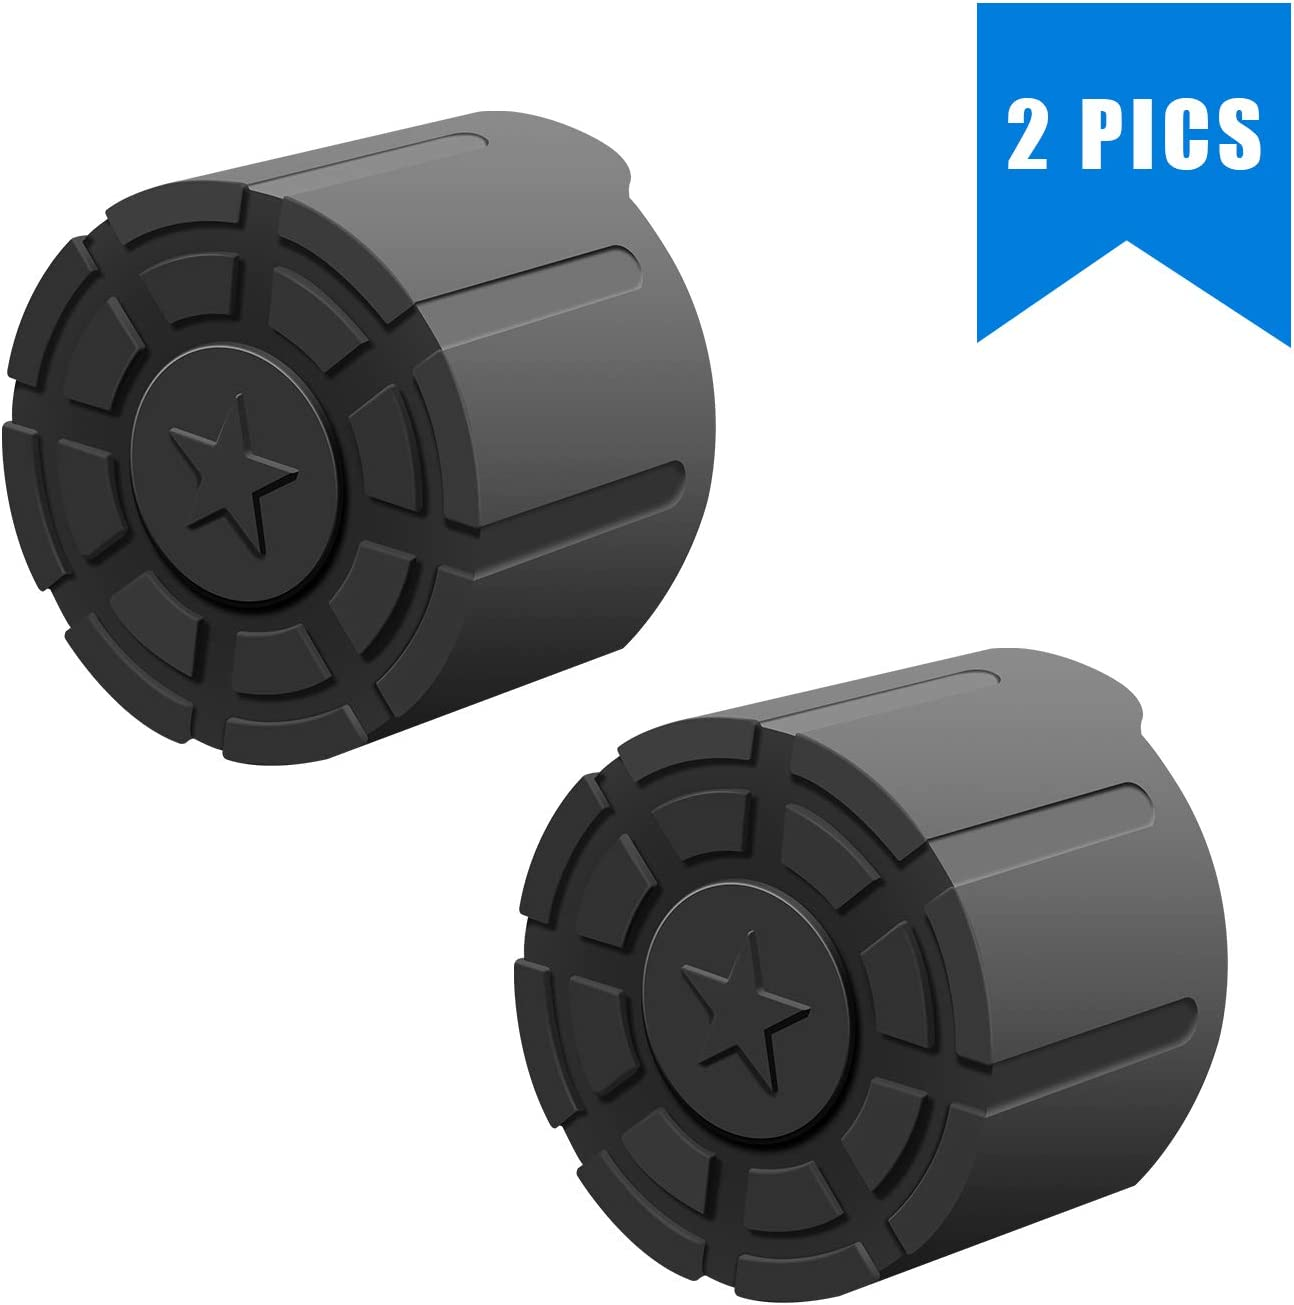 Amazon.com: WALKTREE - Tapa de lente de silicona ...